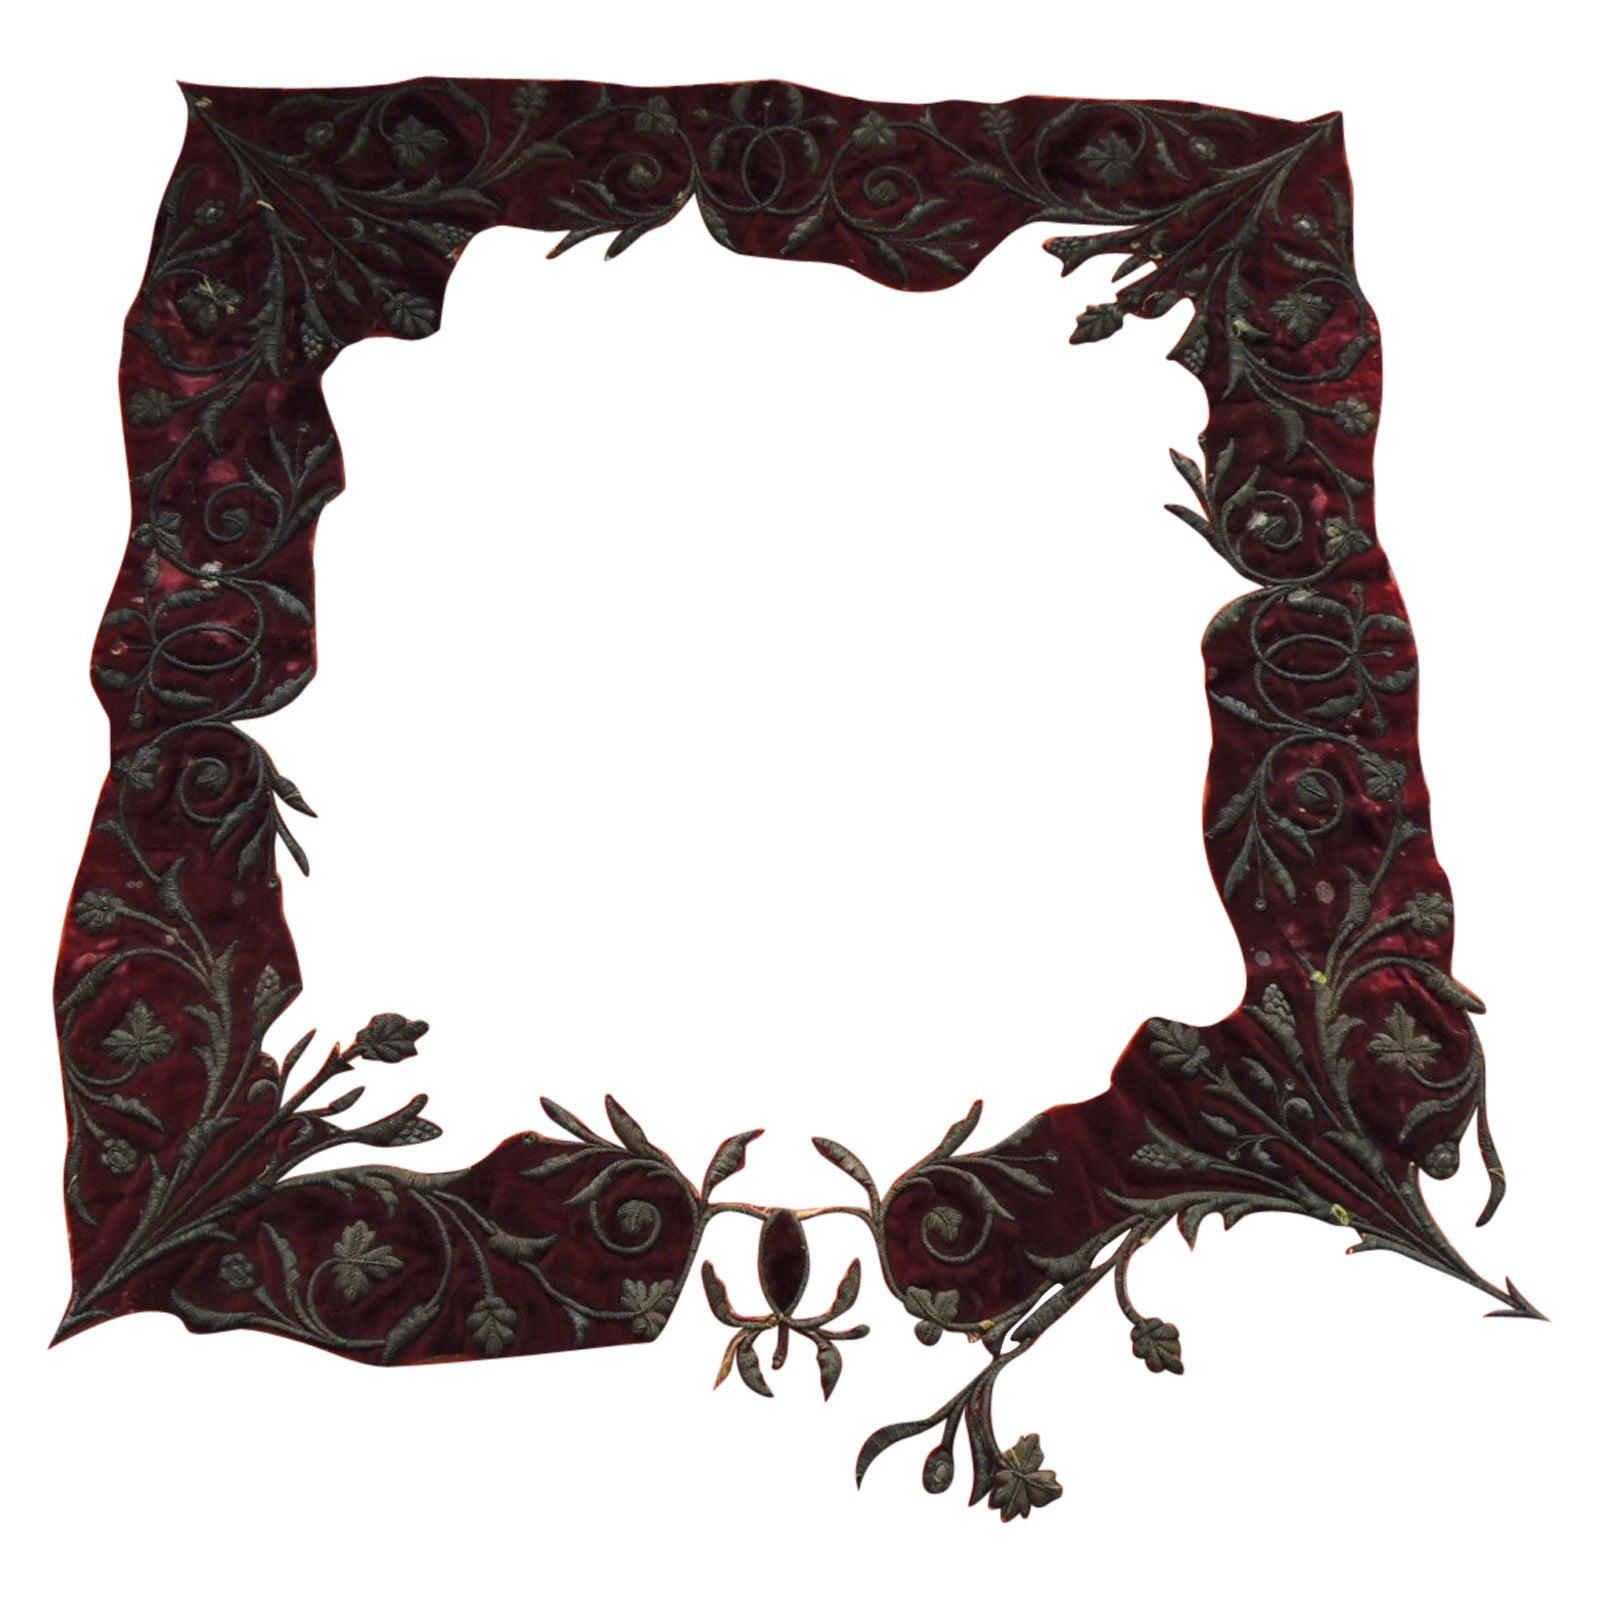 Antique Ottoman Empire Metallic Threads Embroidered Applique Textile